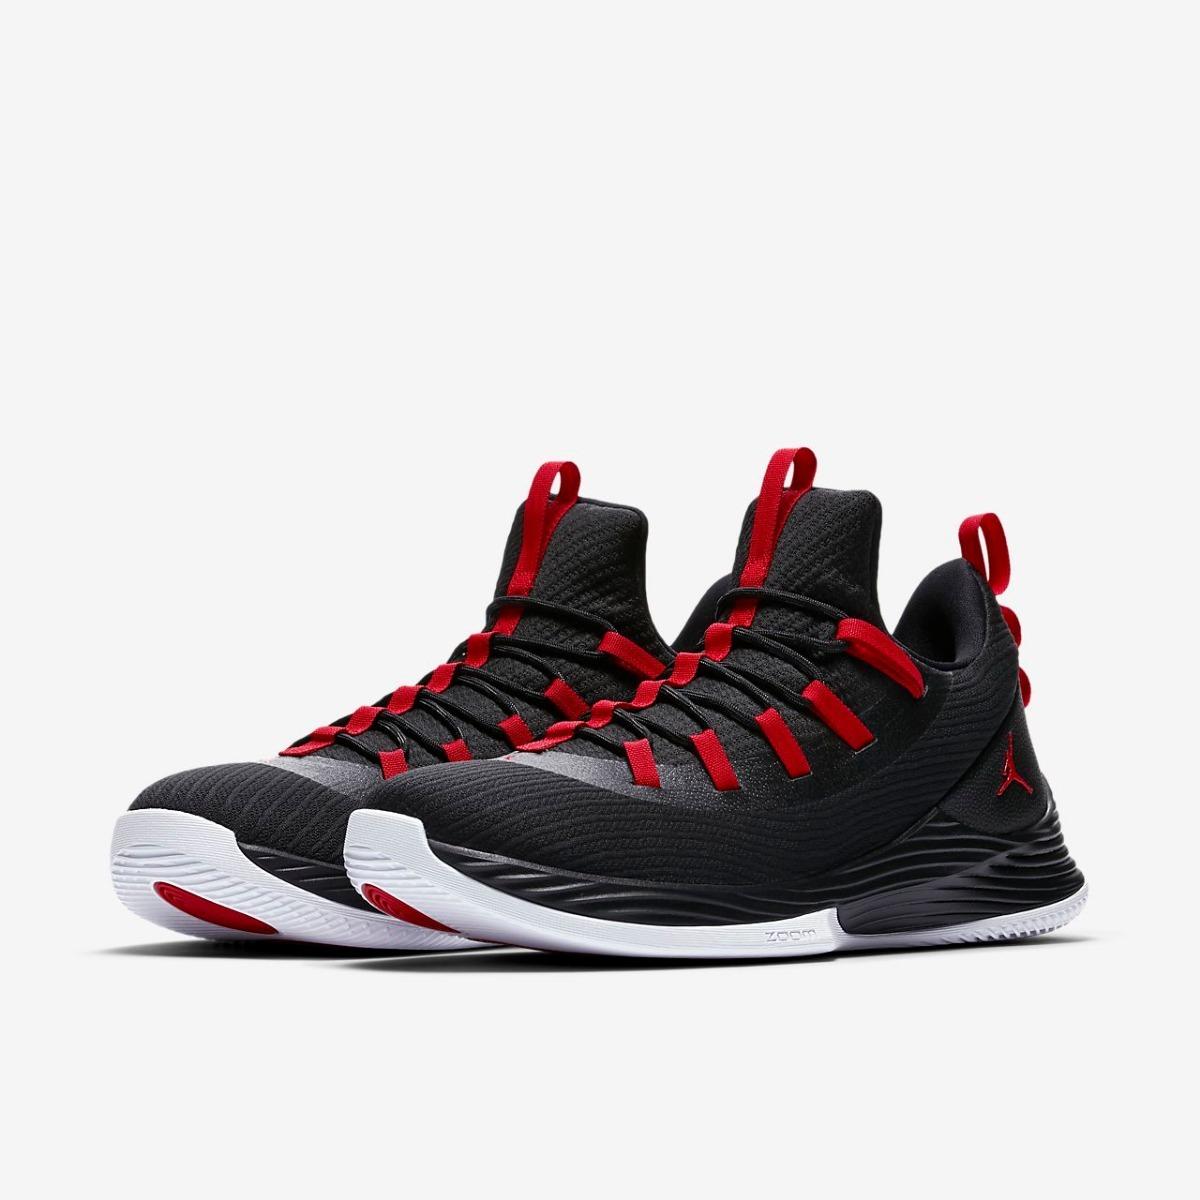 5f9c3c8adc3 tenis jordan negros rojo basquetbol originales ultra fly 2 l. Cargando zoom.